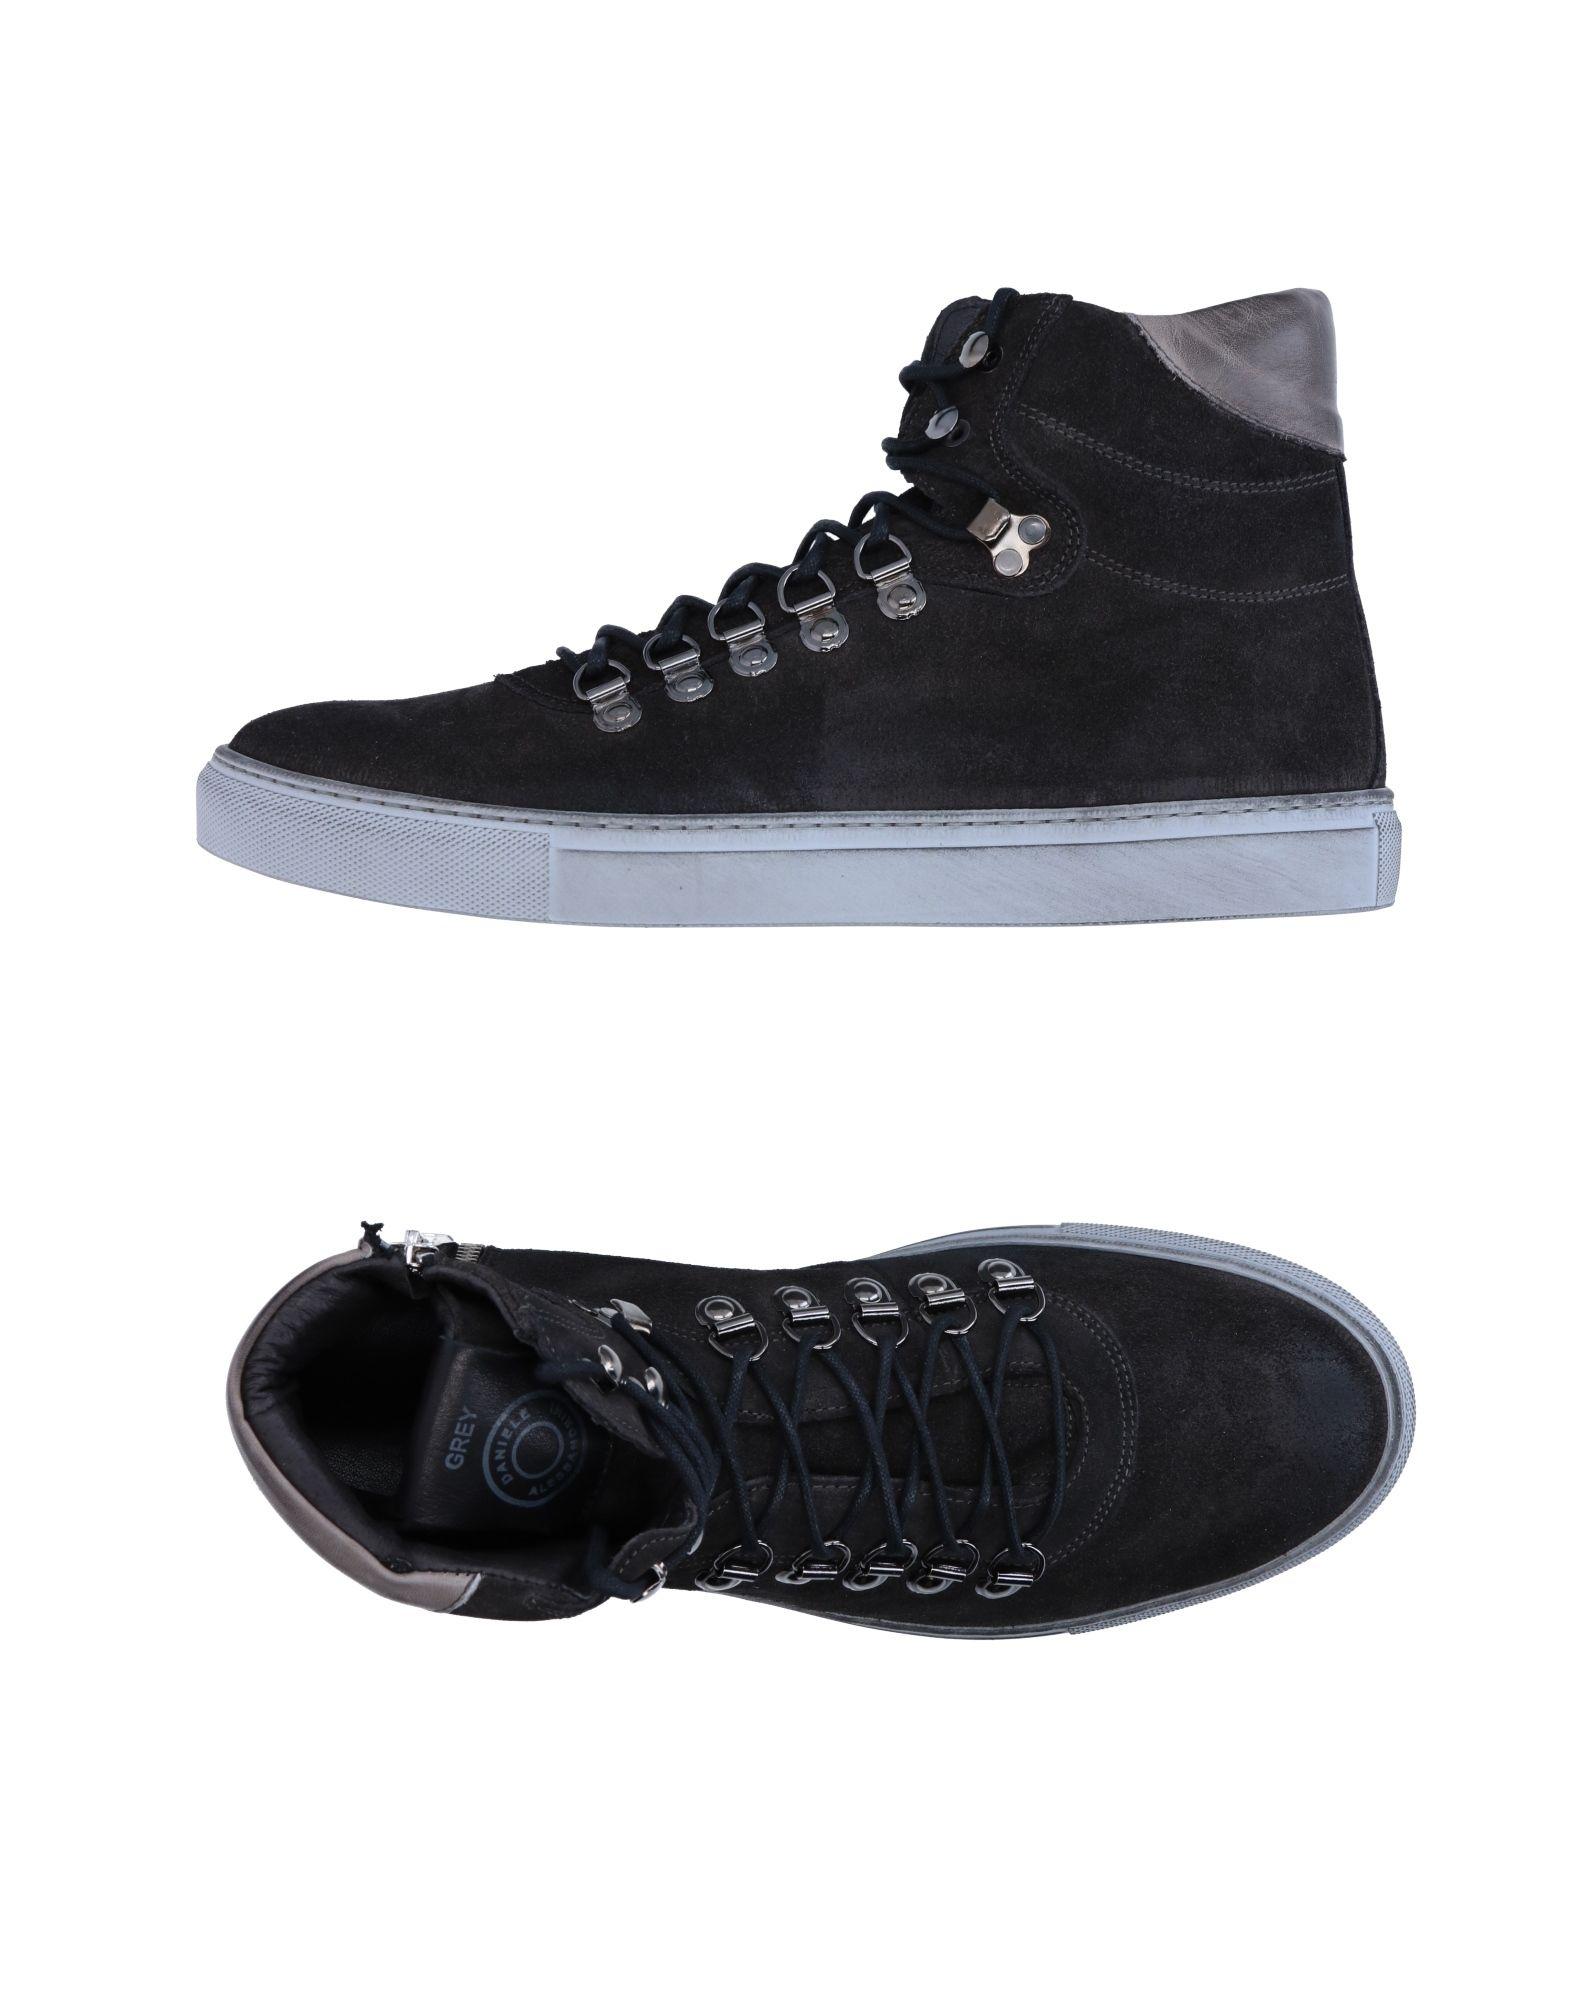 Rabatt echte Schuhe Daniele Alessandrini Sneakers Herren  11253470XV